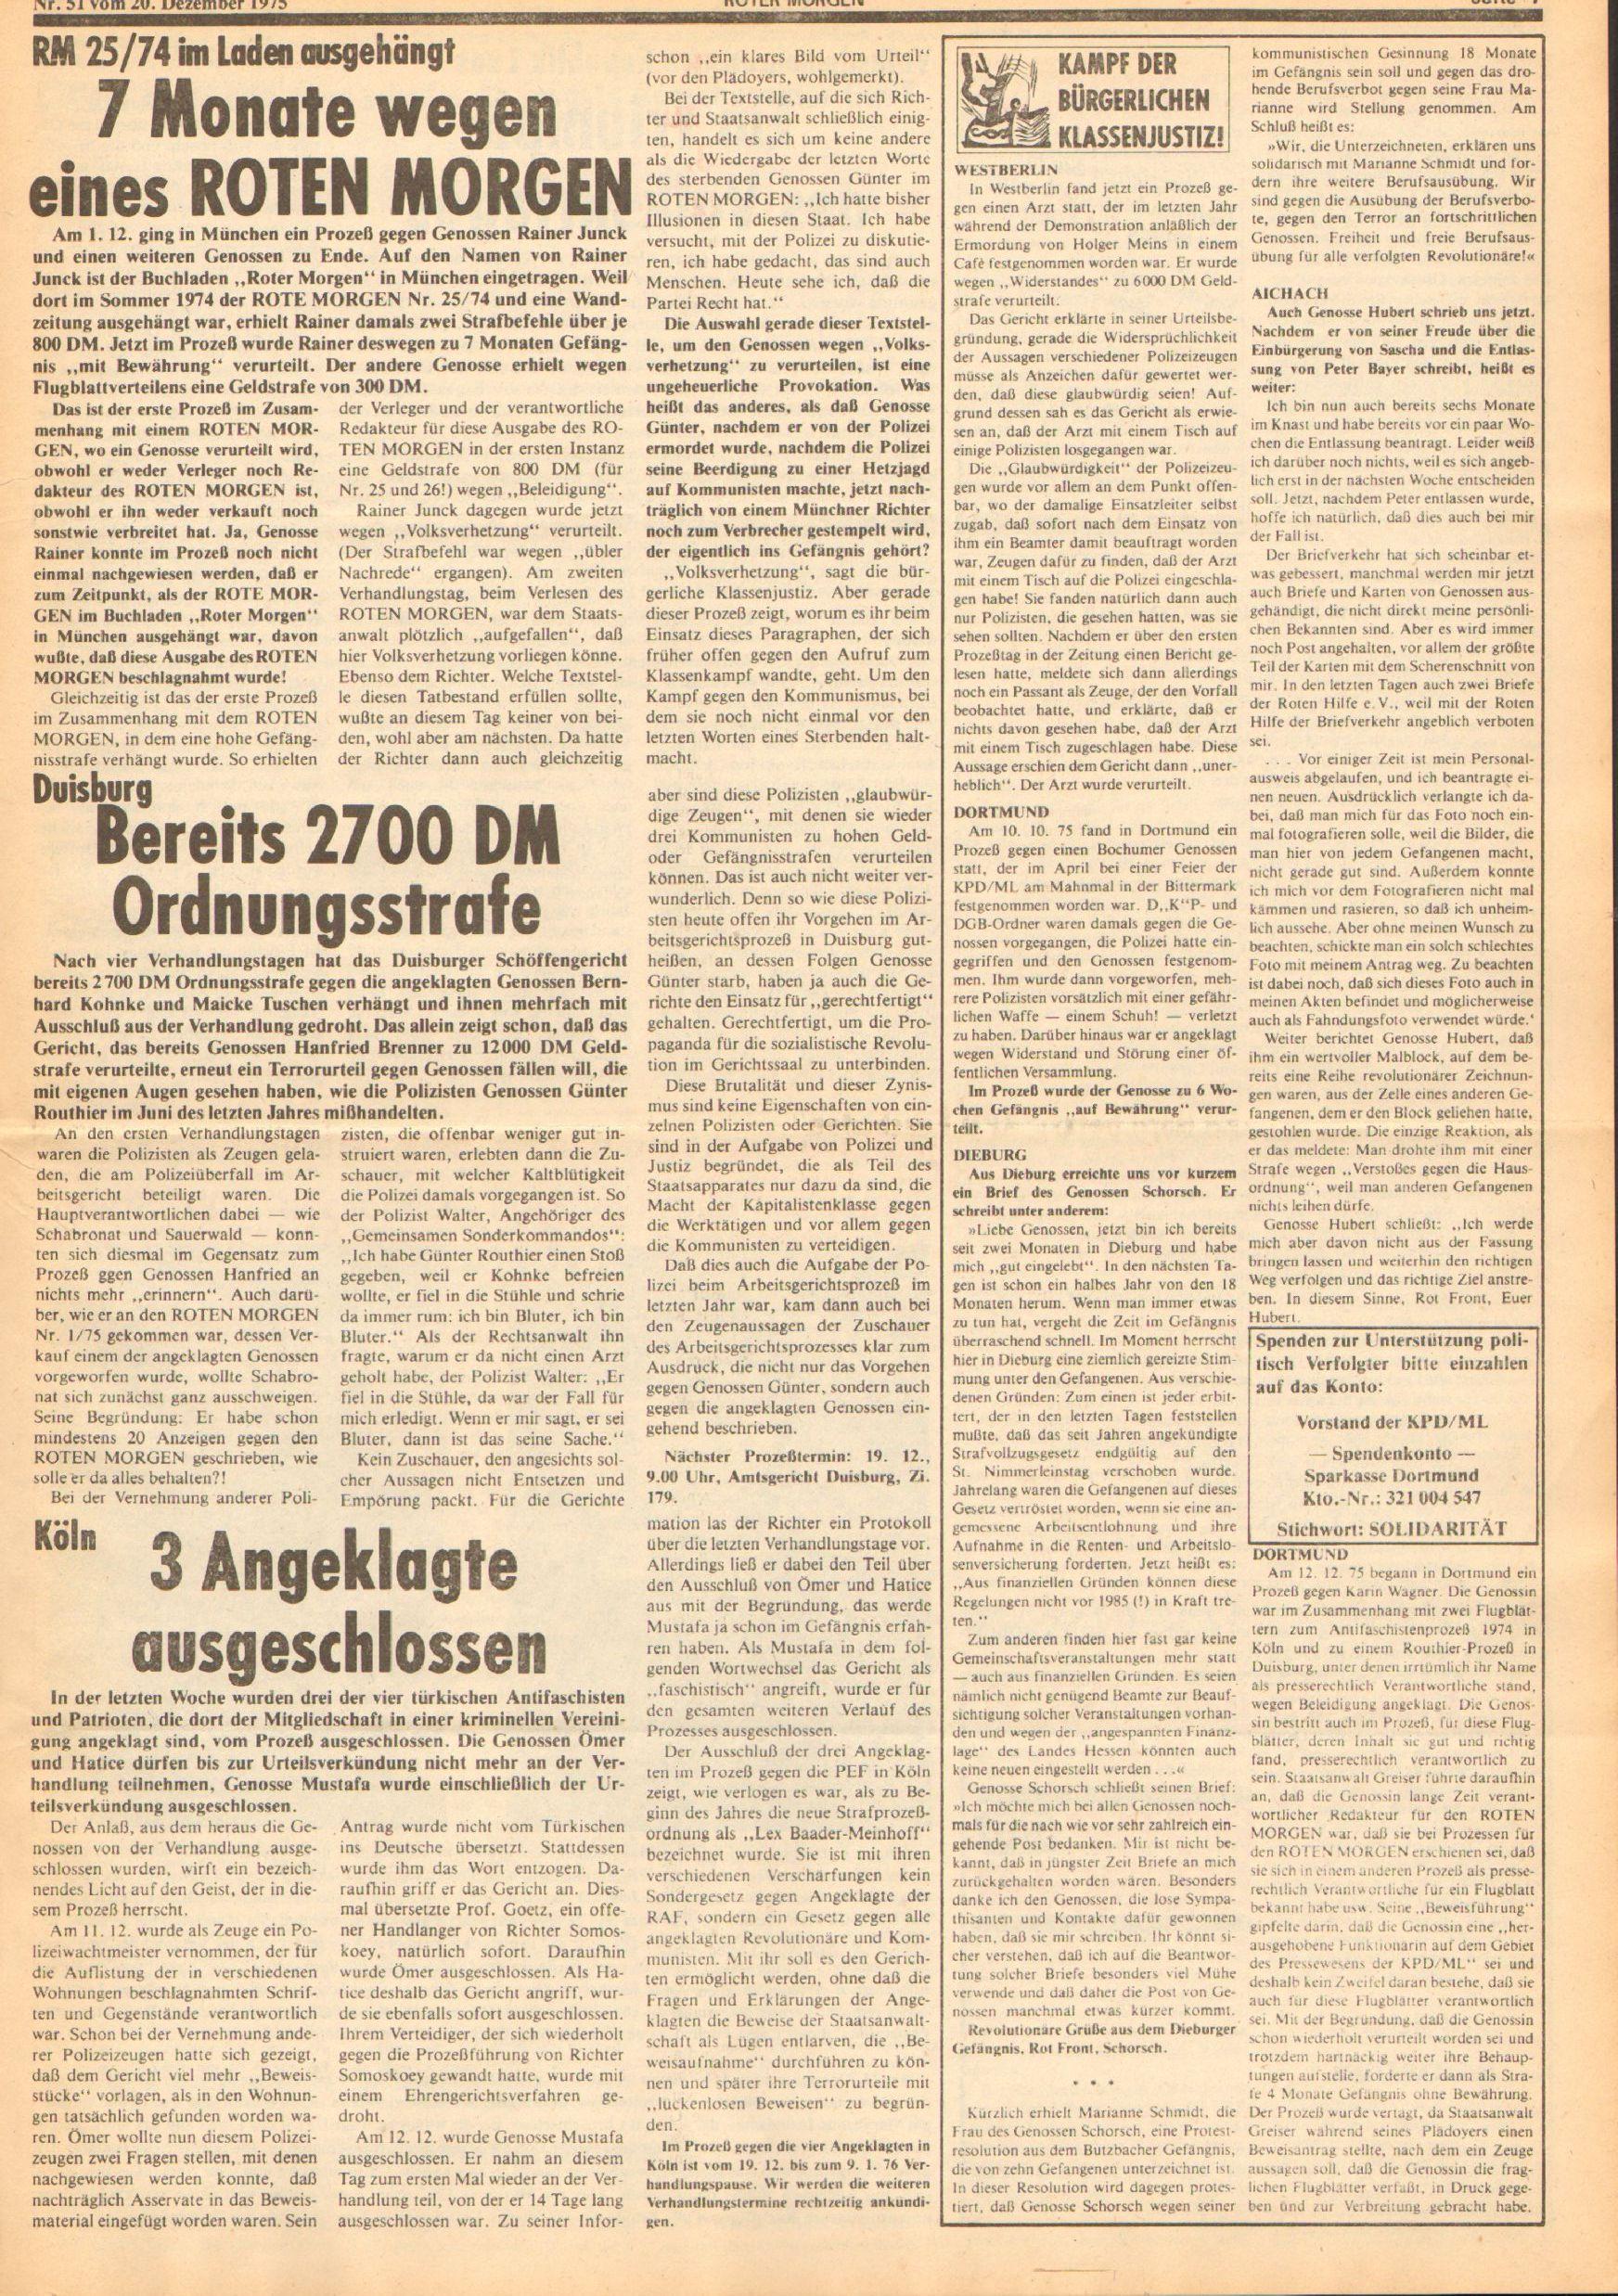 Roter Morgen, 9. Jg., 20. Dezember 1975, Nr. 51, Seite 7